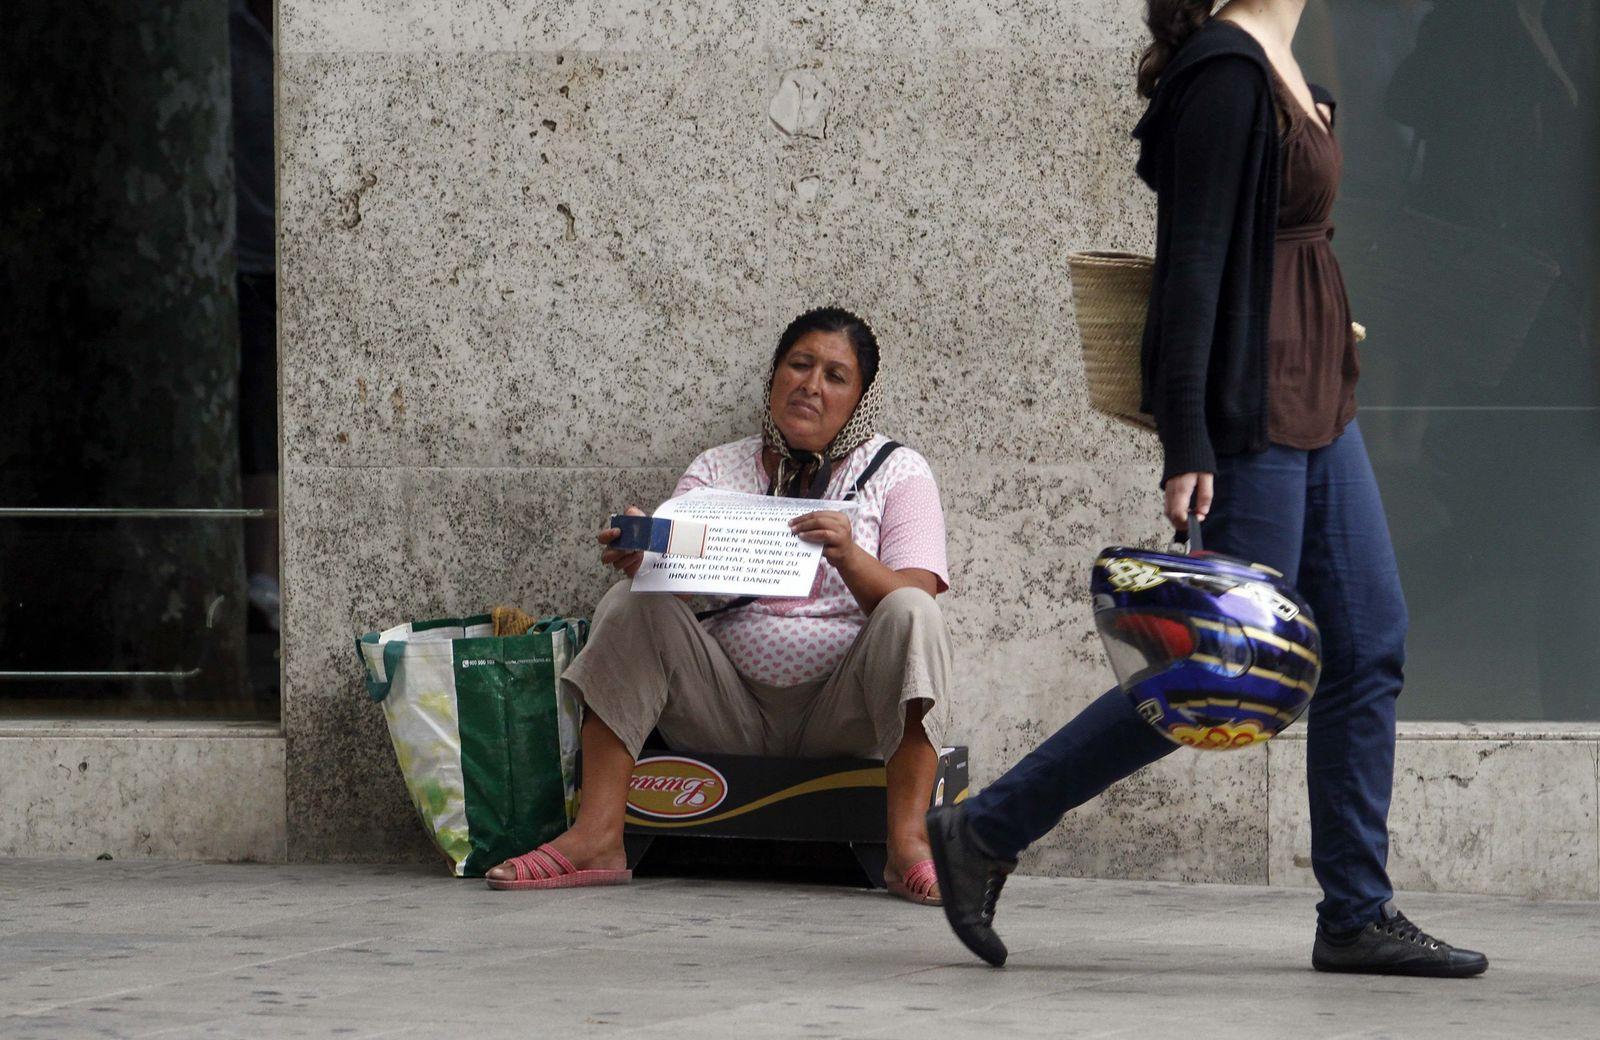 Spanien/ Armut